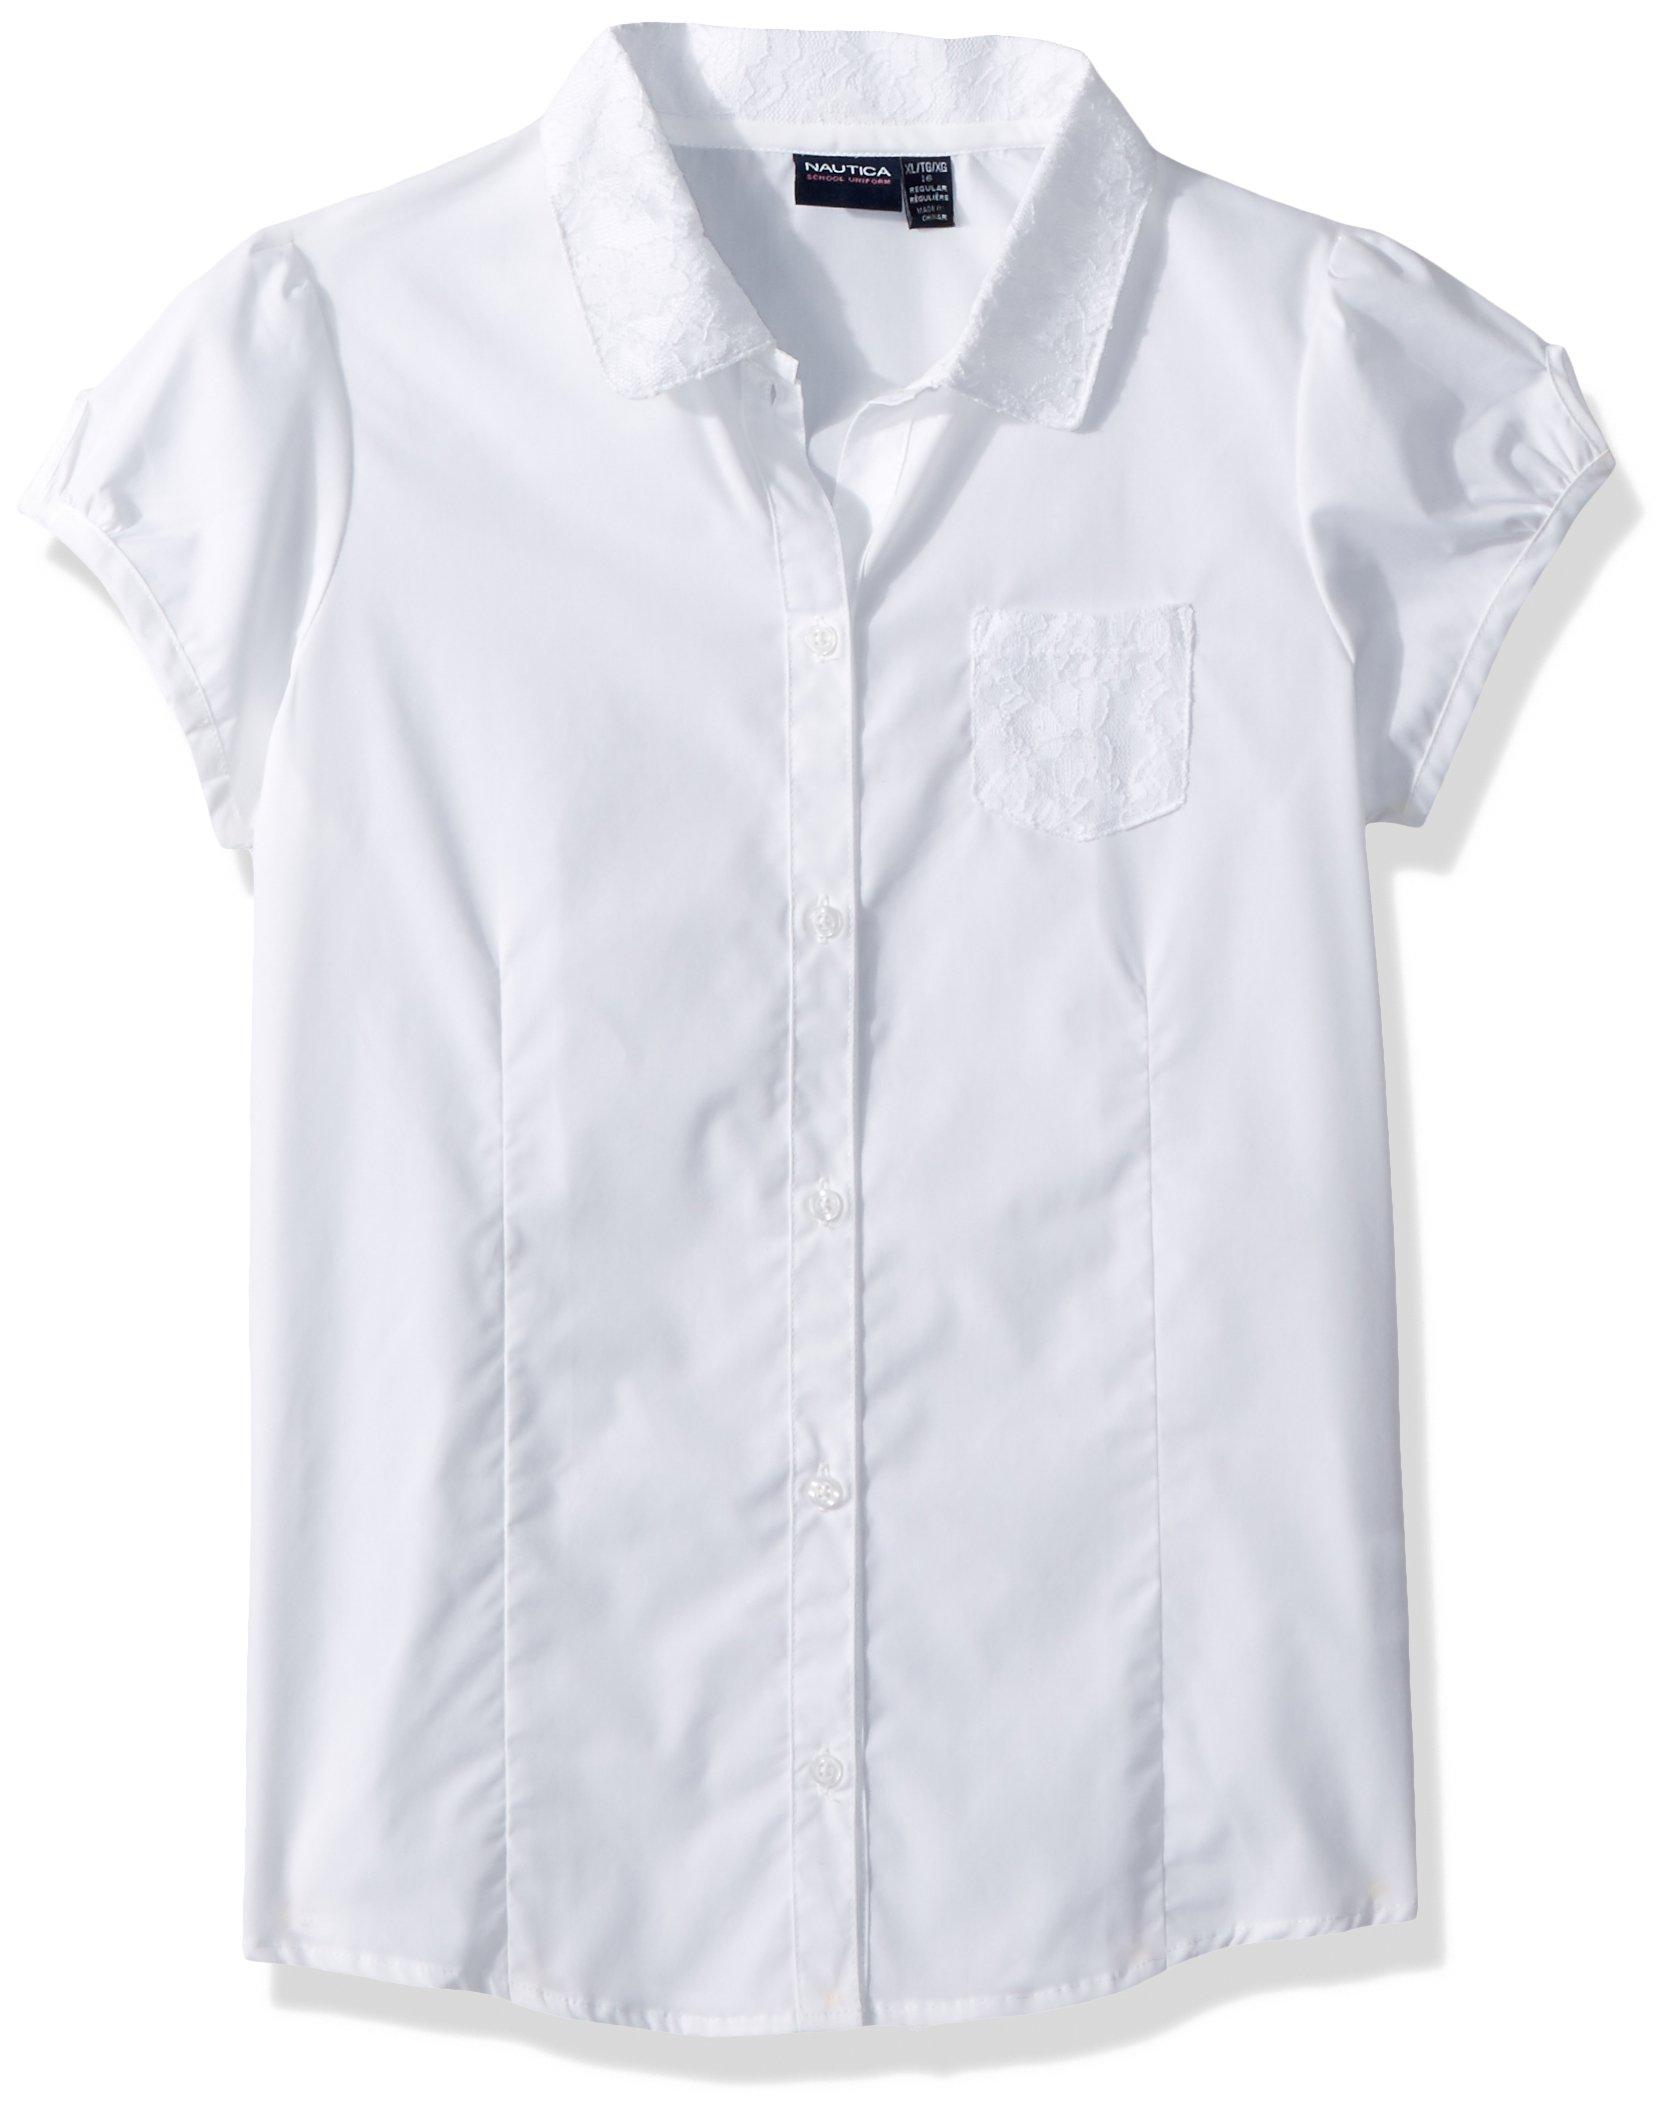 Nautica Big Girls' Uniform Short-Sleeve Blouse, White/Lace, L (12/14)